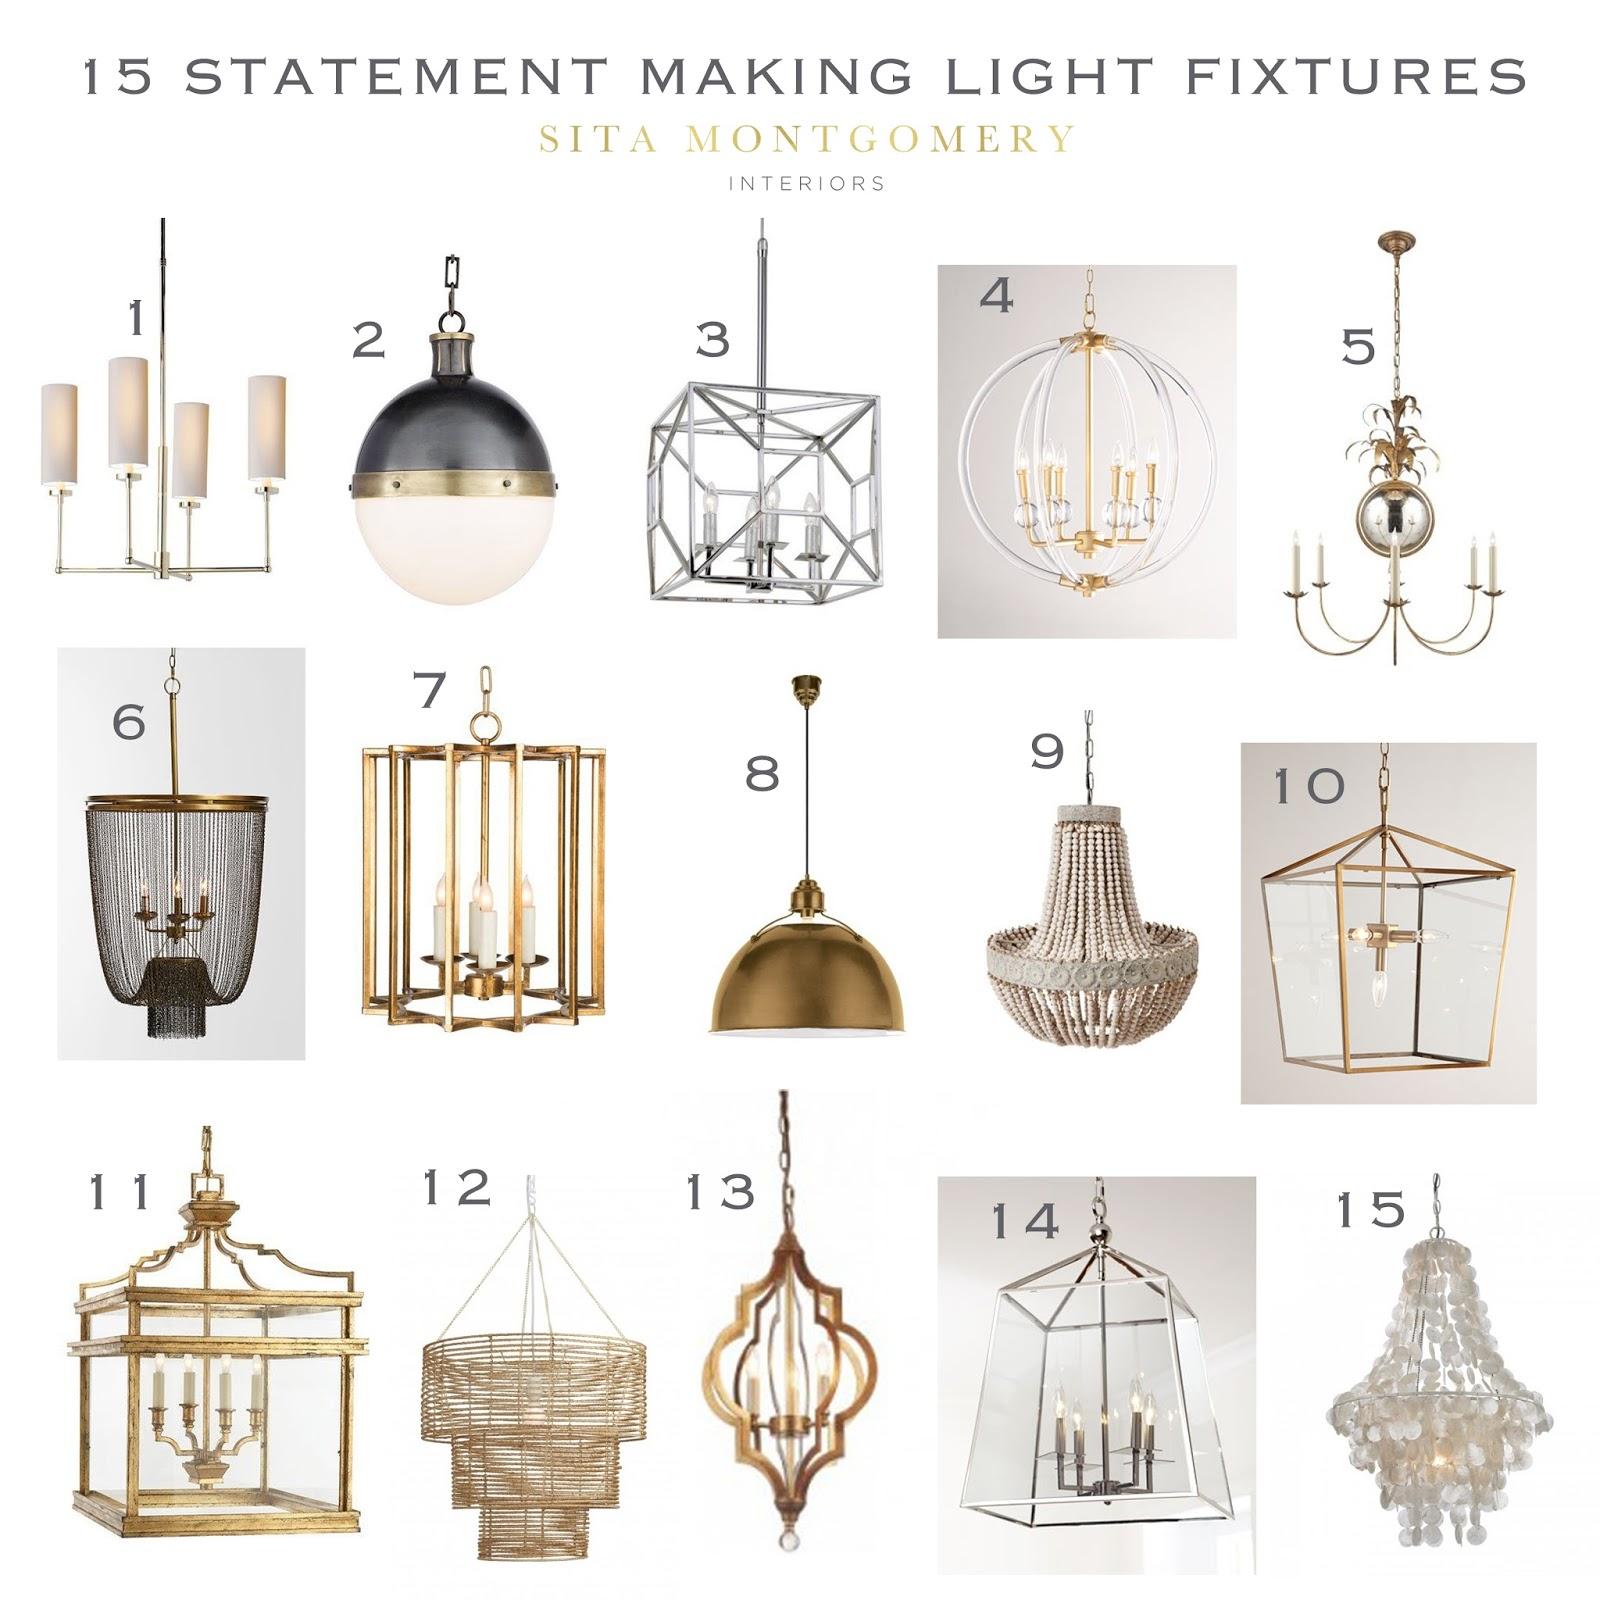 15 statement making light fixtures sita montgomery interiors. Black Bedroom Furniture Sets. Home Design Ideas